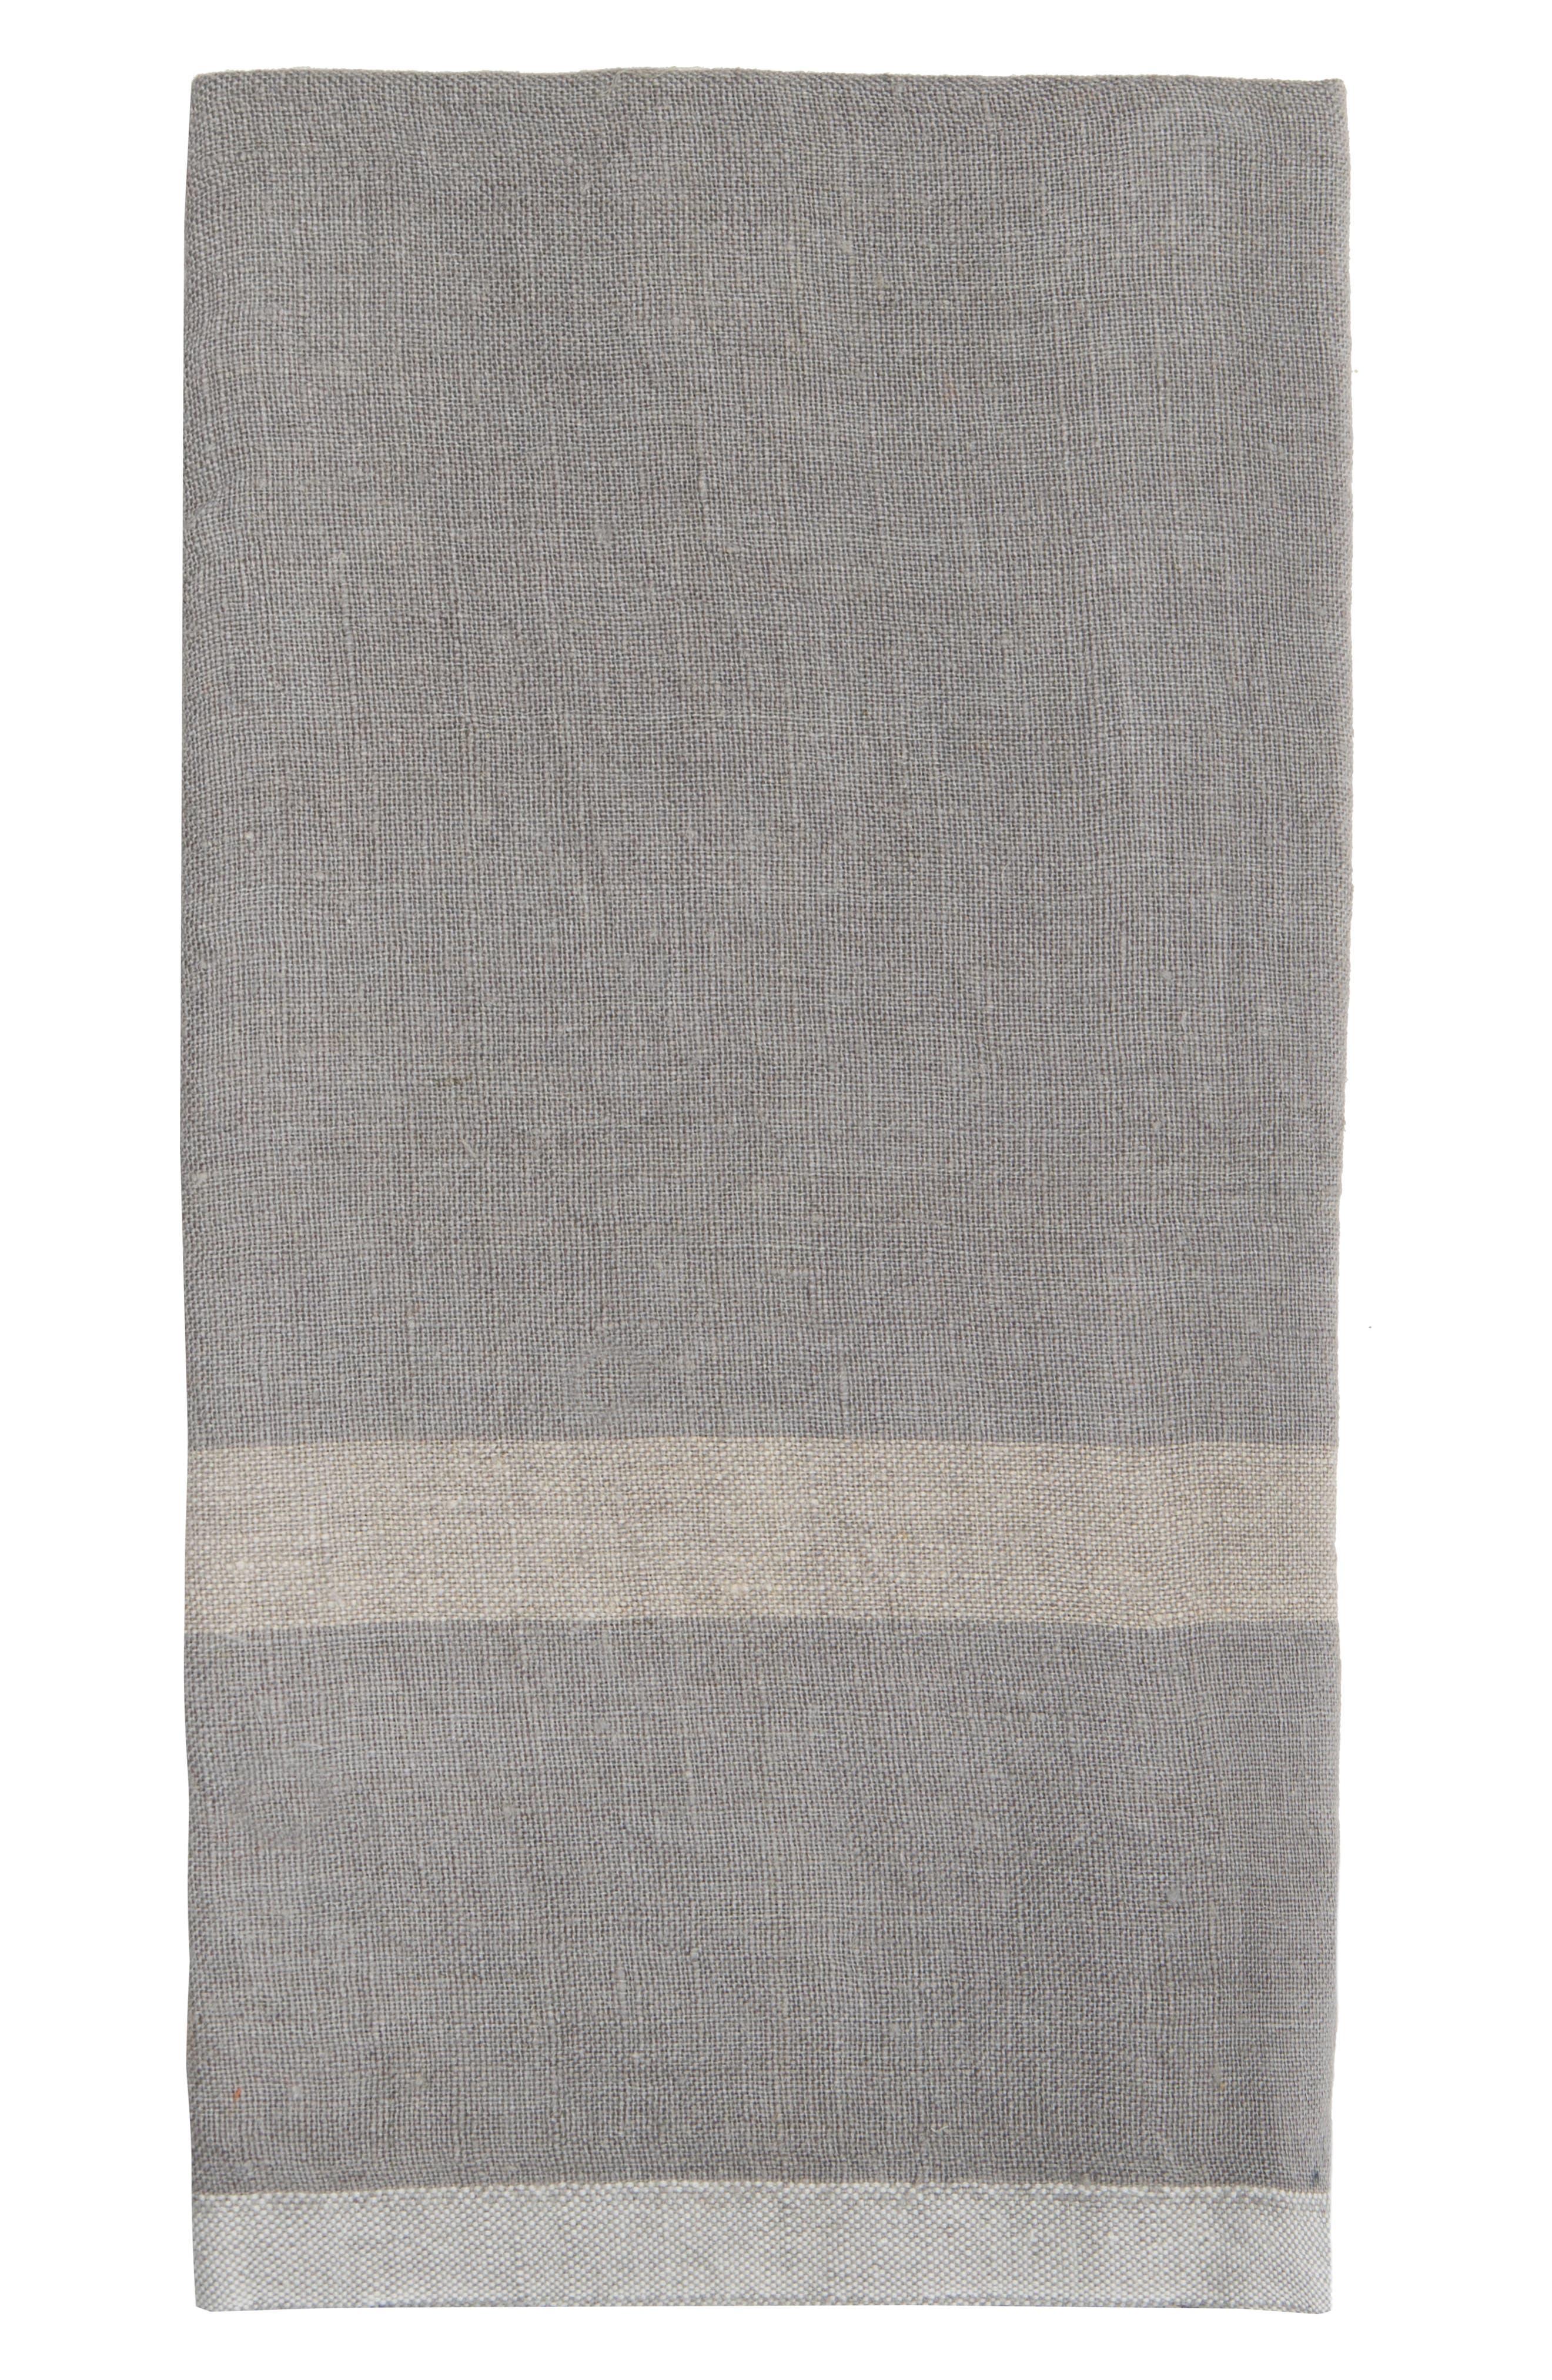 Caravan Set Of 2 Laundered Linen Tea Towels Size One Size  Grey